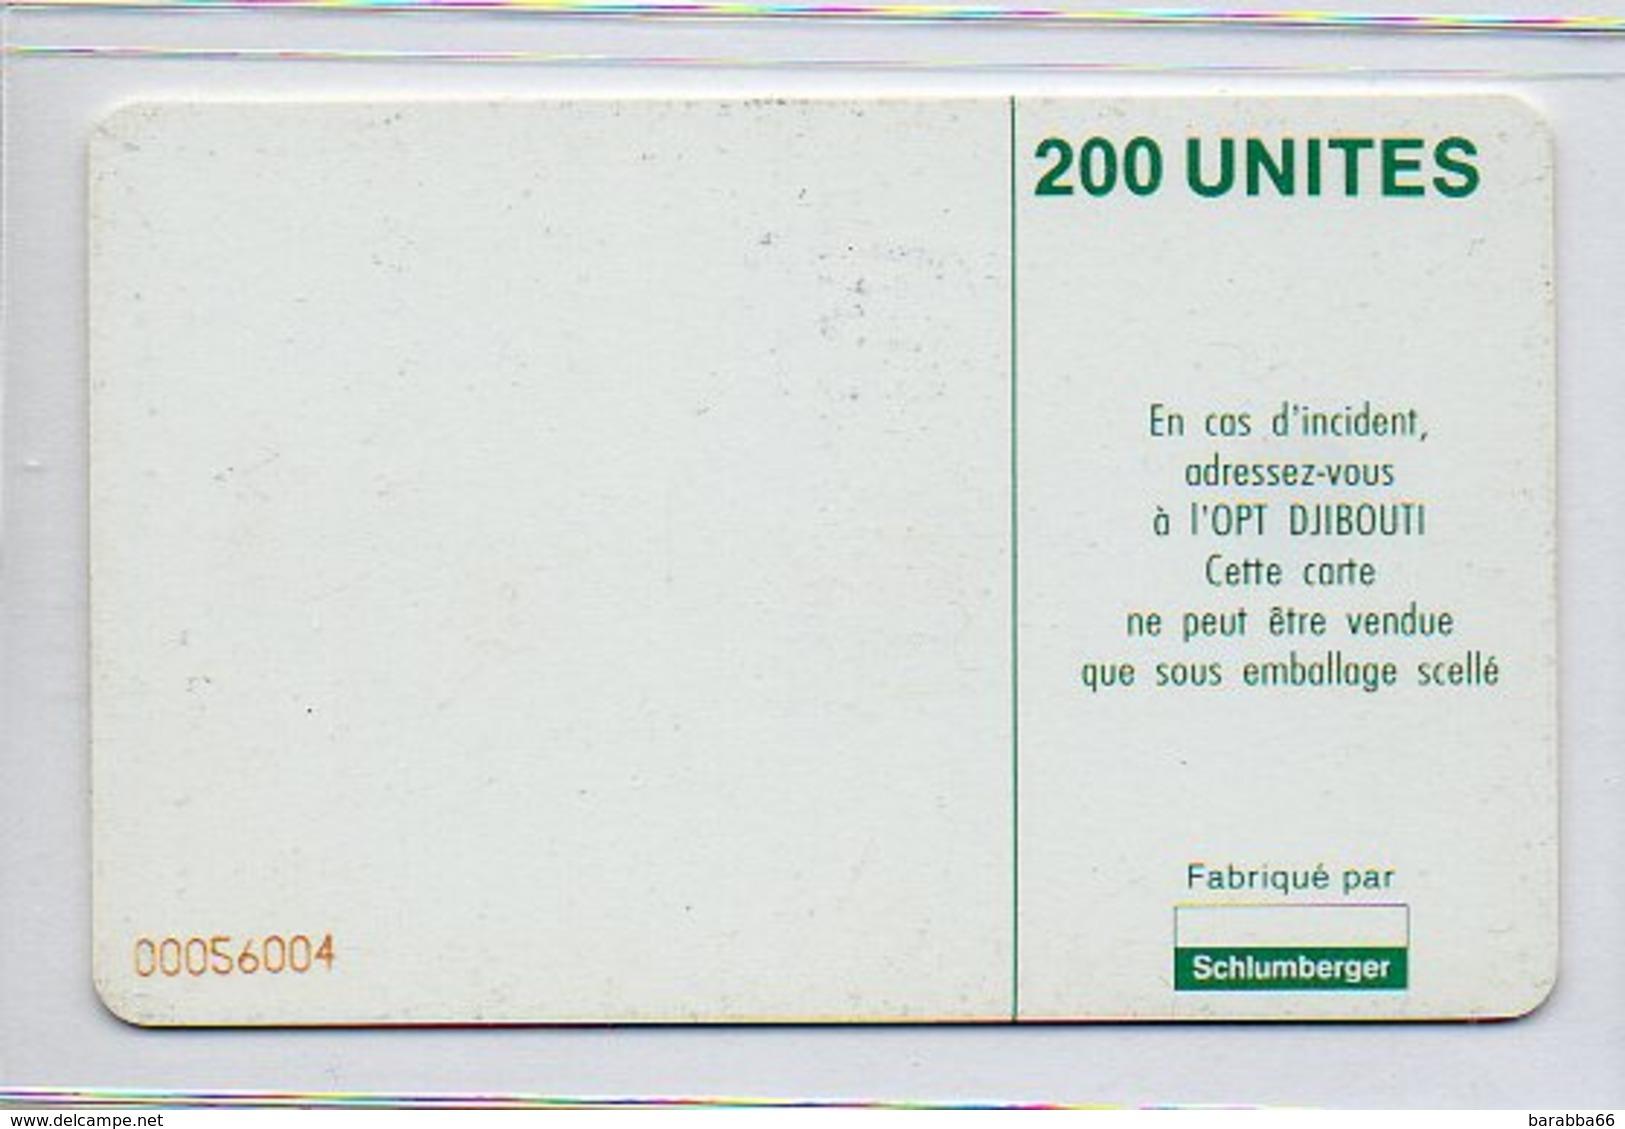 TELECARTE - 200 UNITES - Djibouti